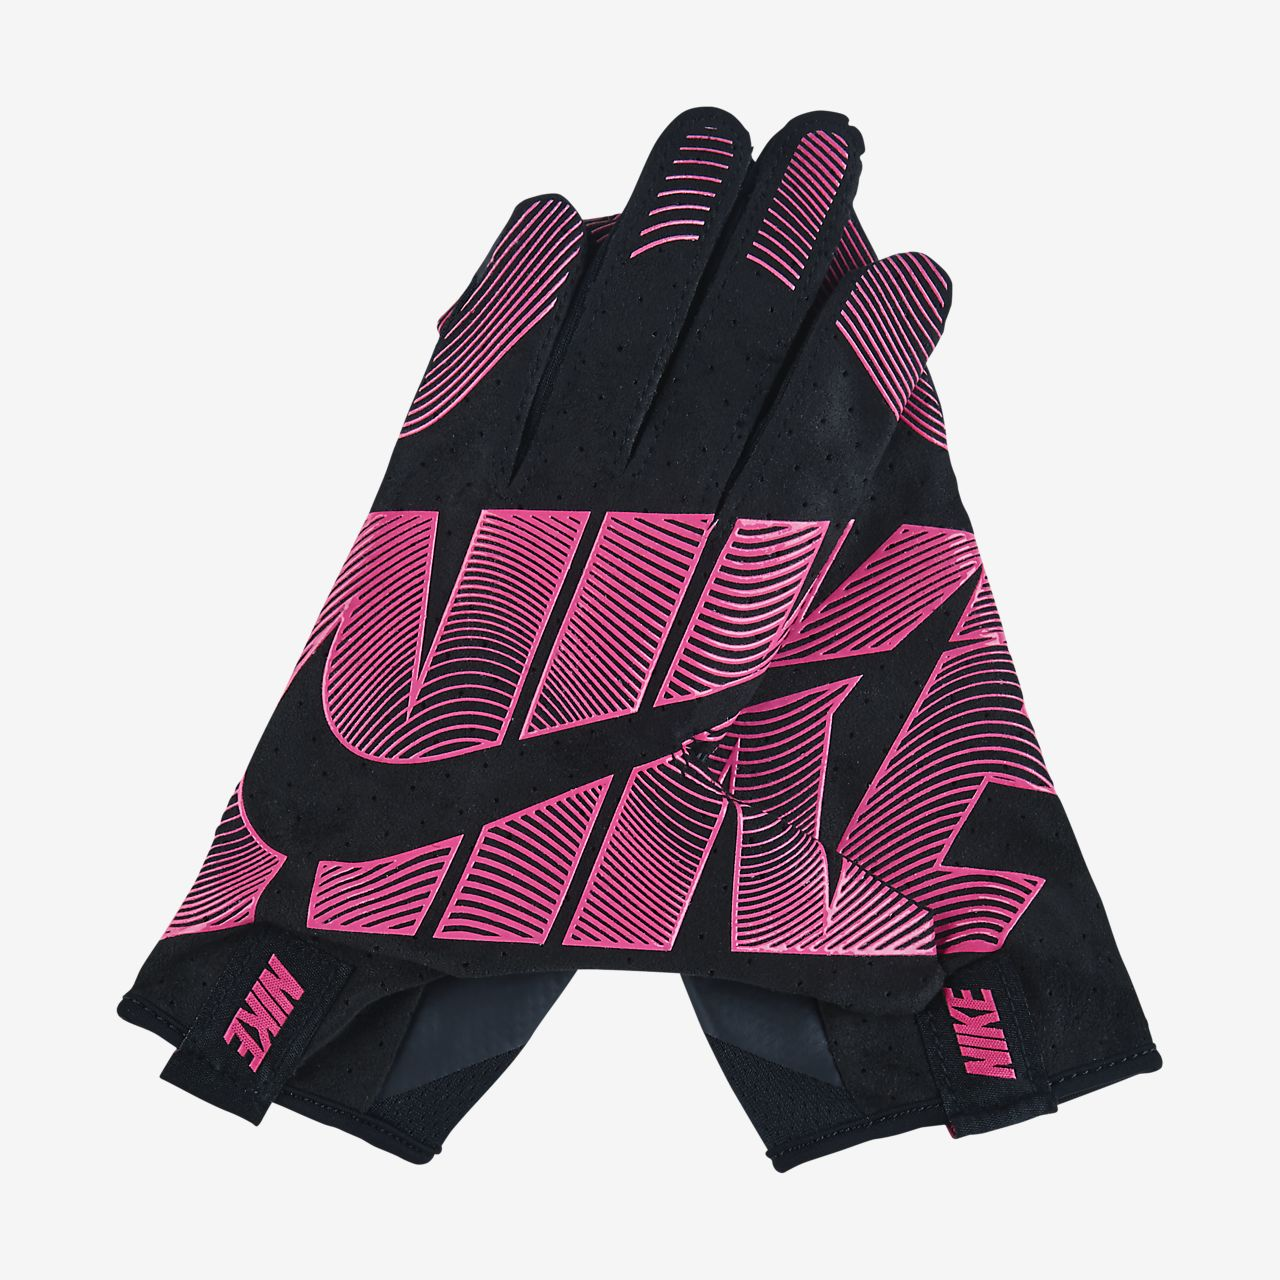 Nike Lunatic Damen-Trainingshandschuhe